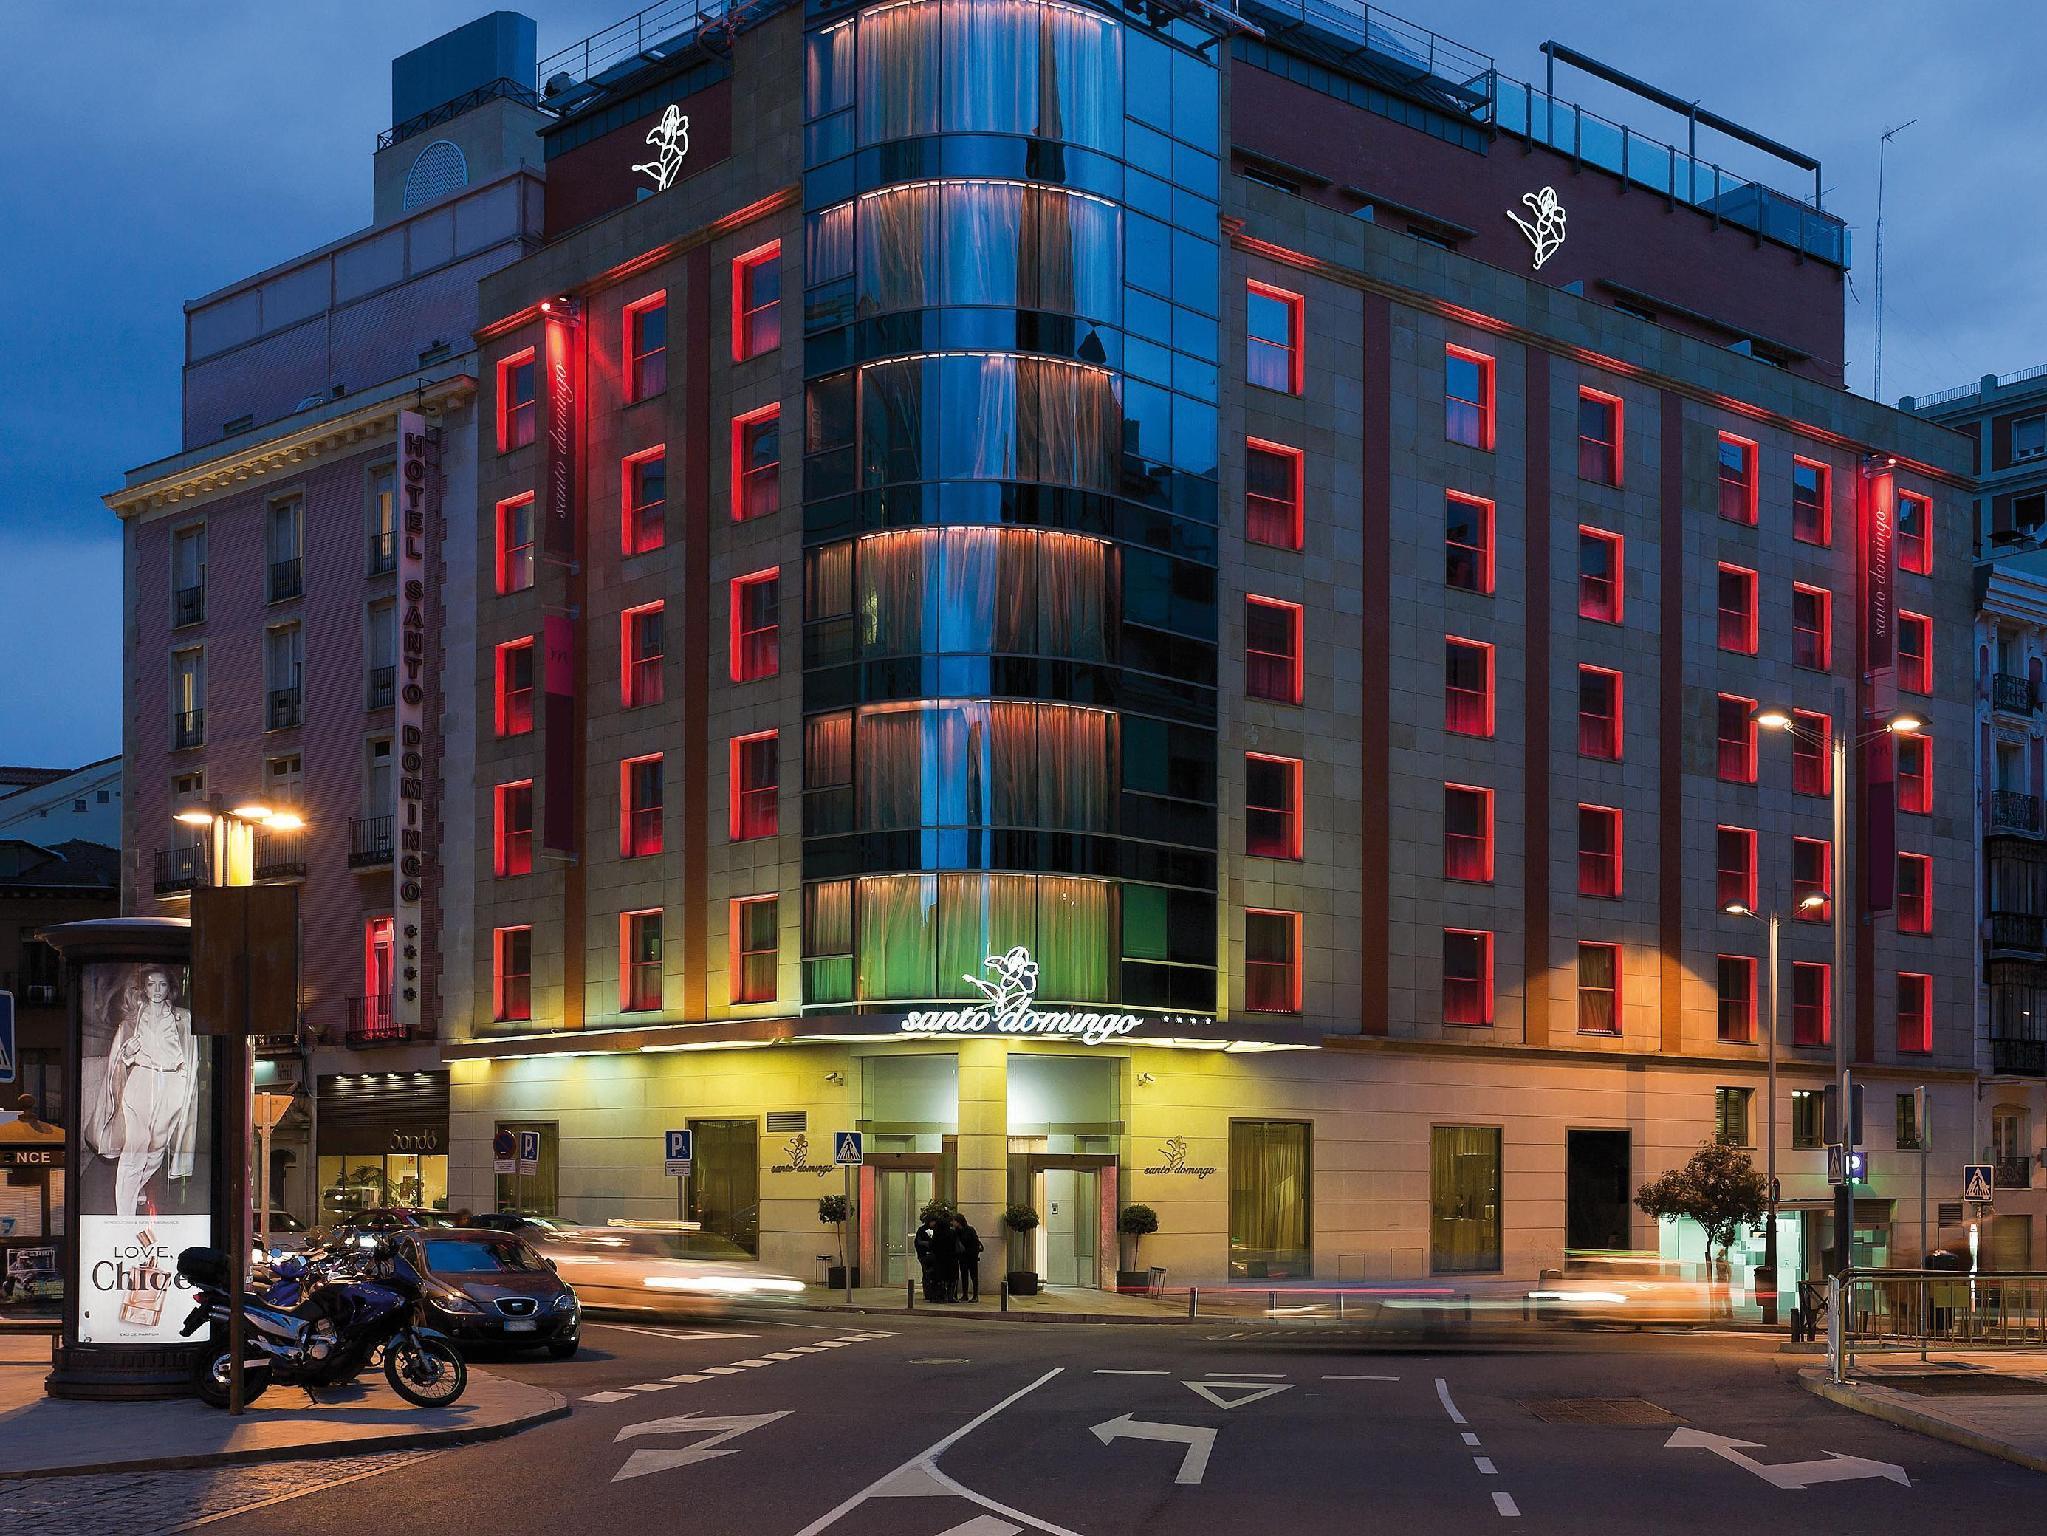 Hotel santo domingo city center madrid spain great for Hoteis madrid